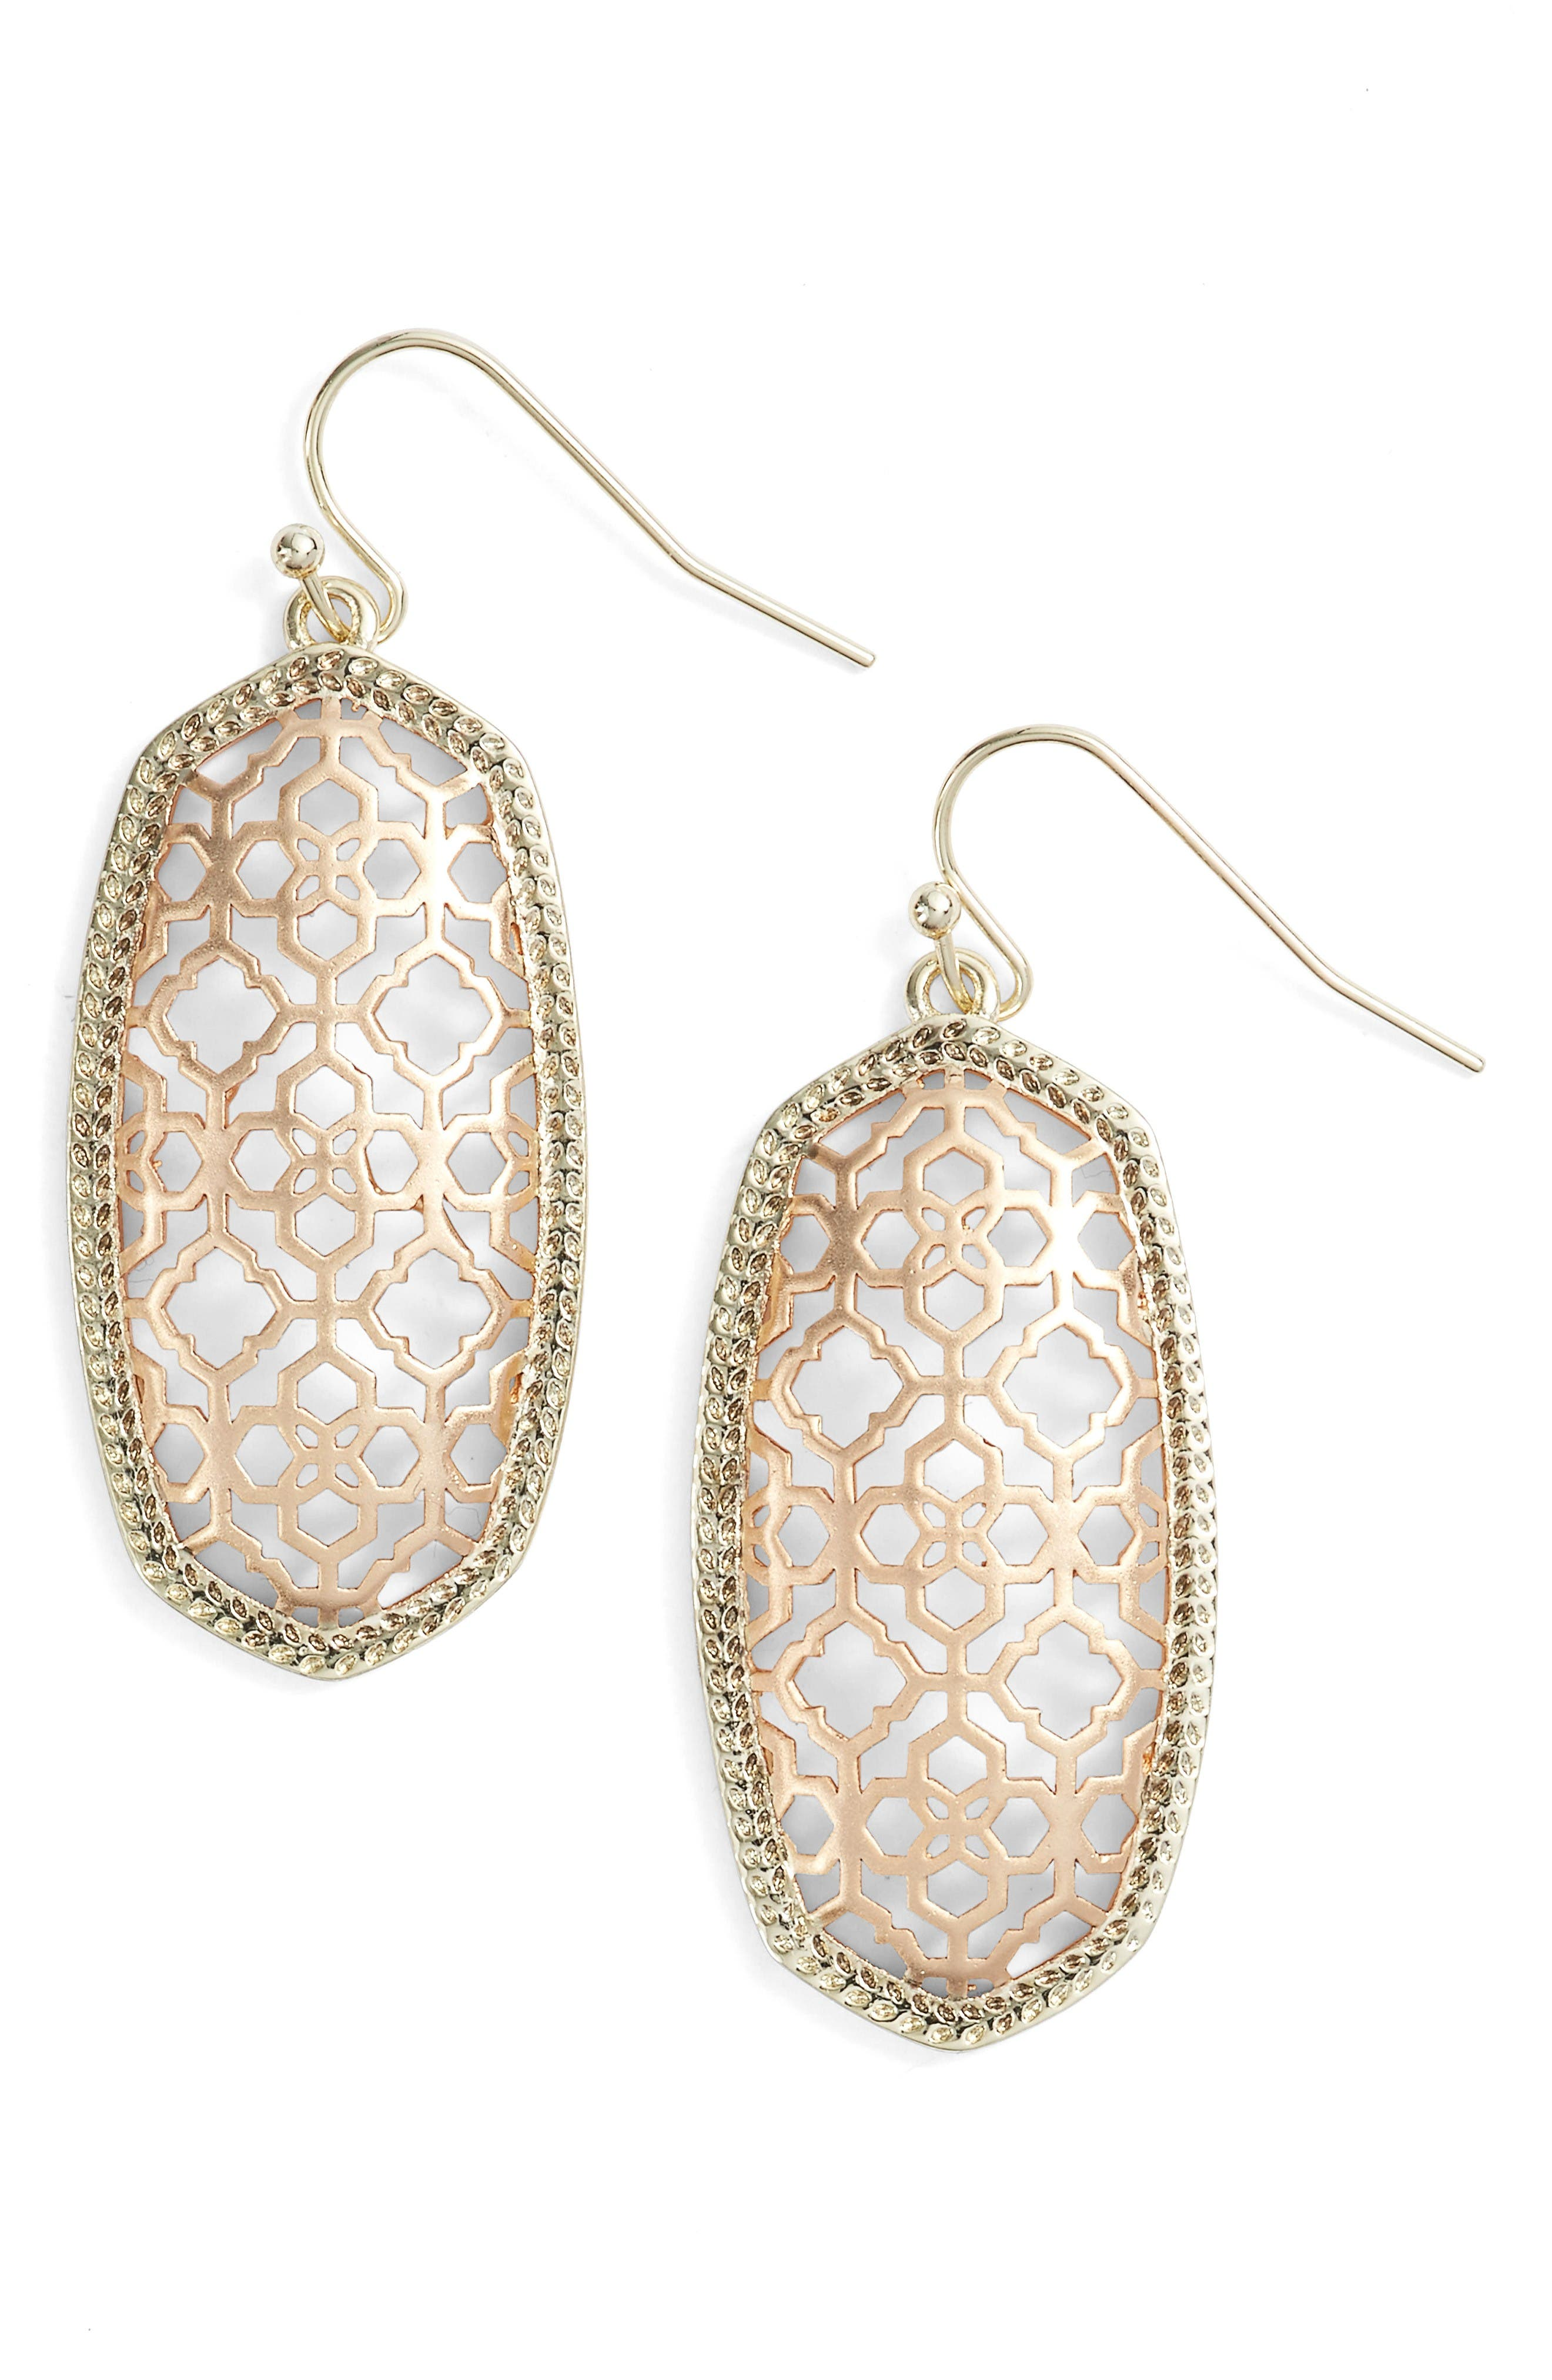 Elle Openwork Drop Earrings,                         Main,                         color, Gold/Rose Gold